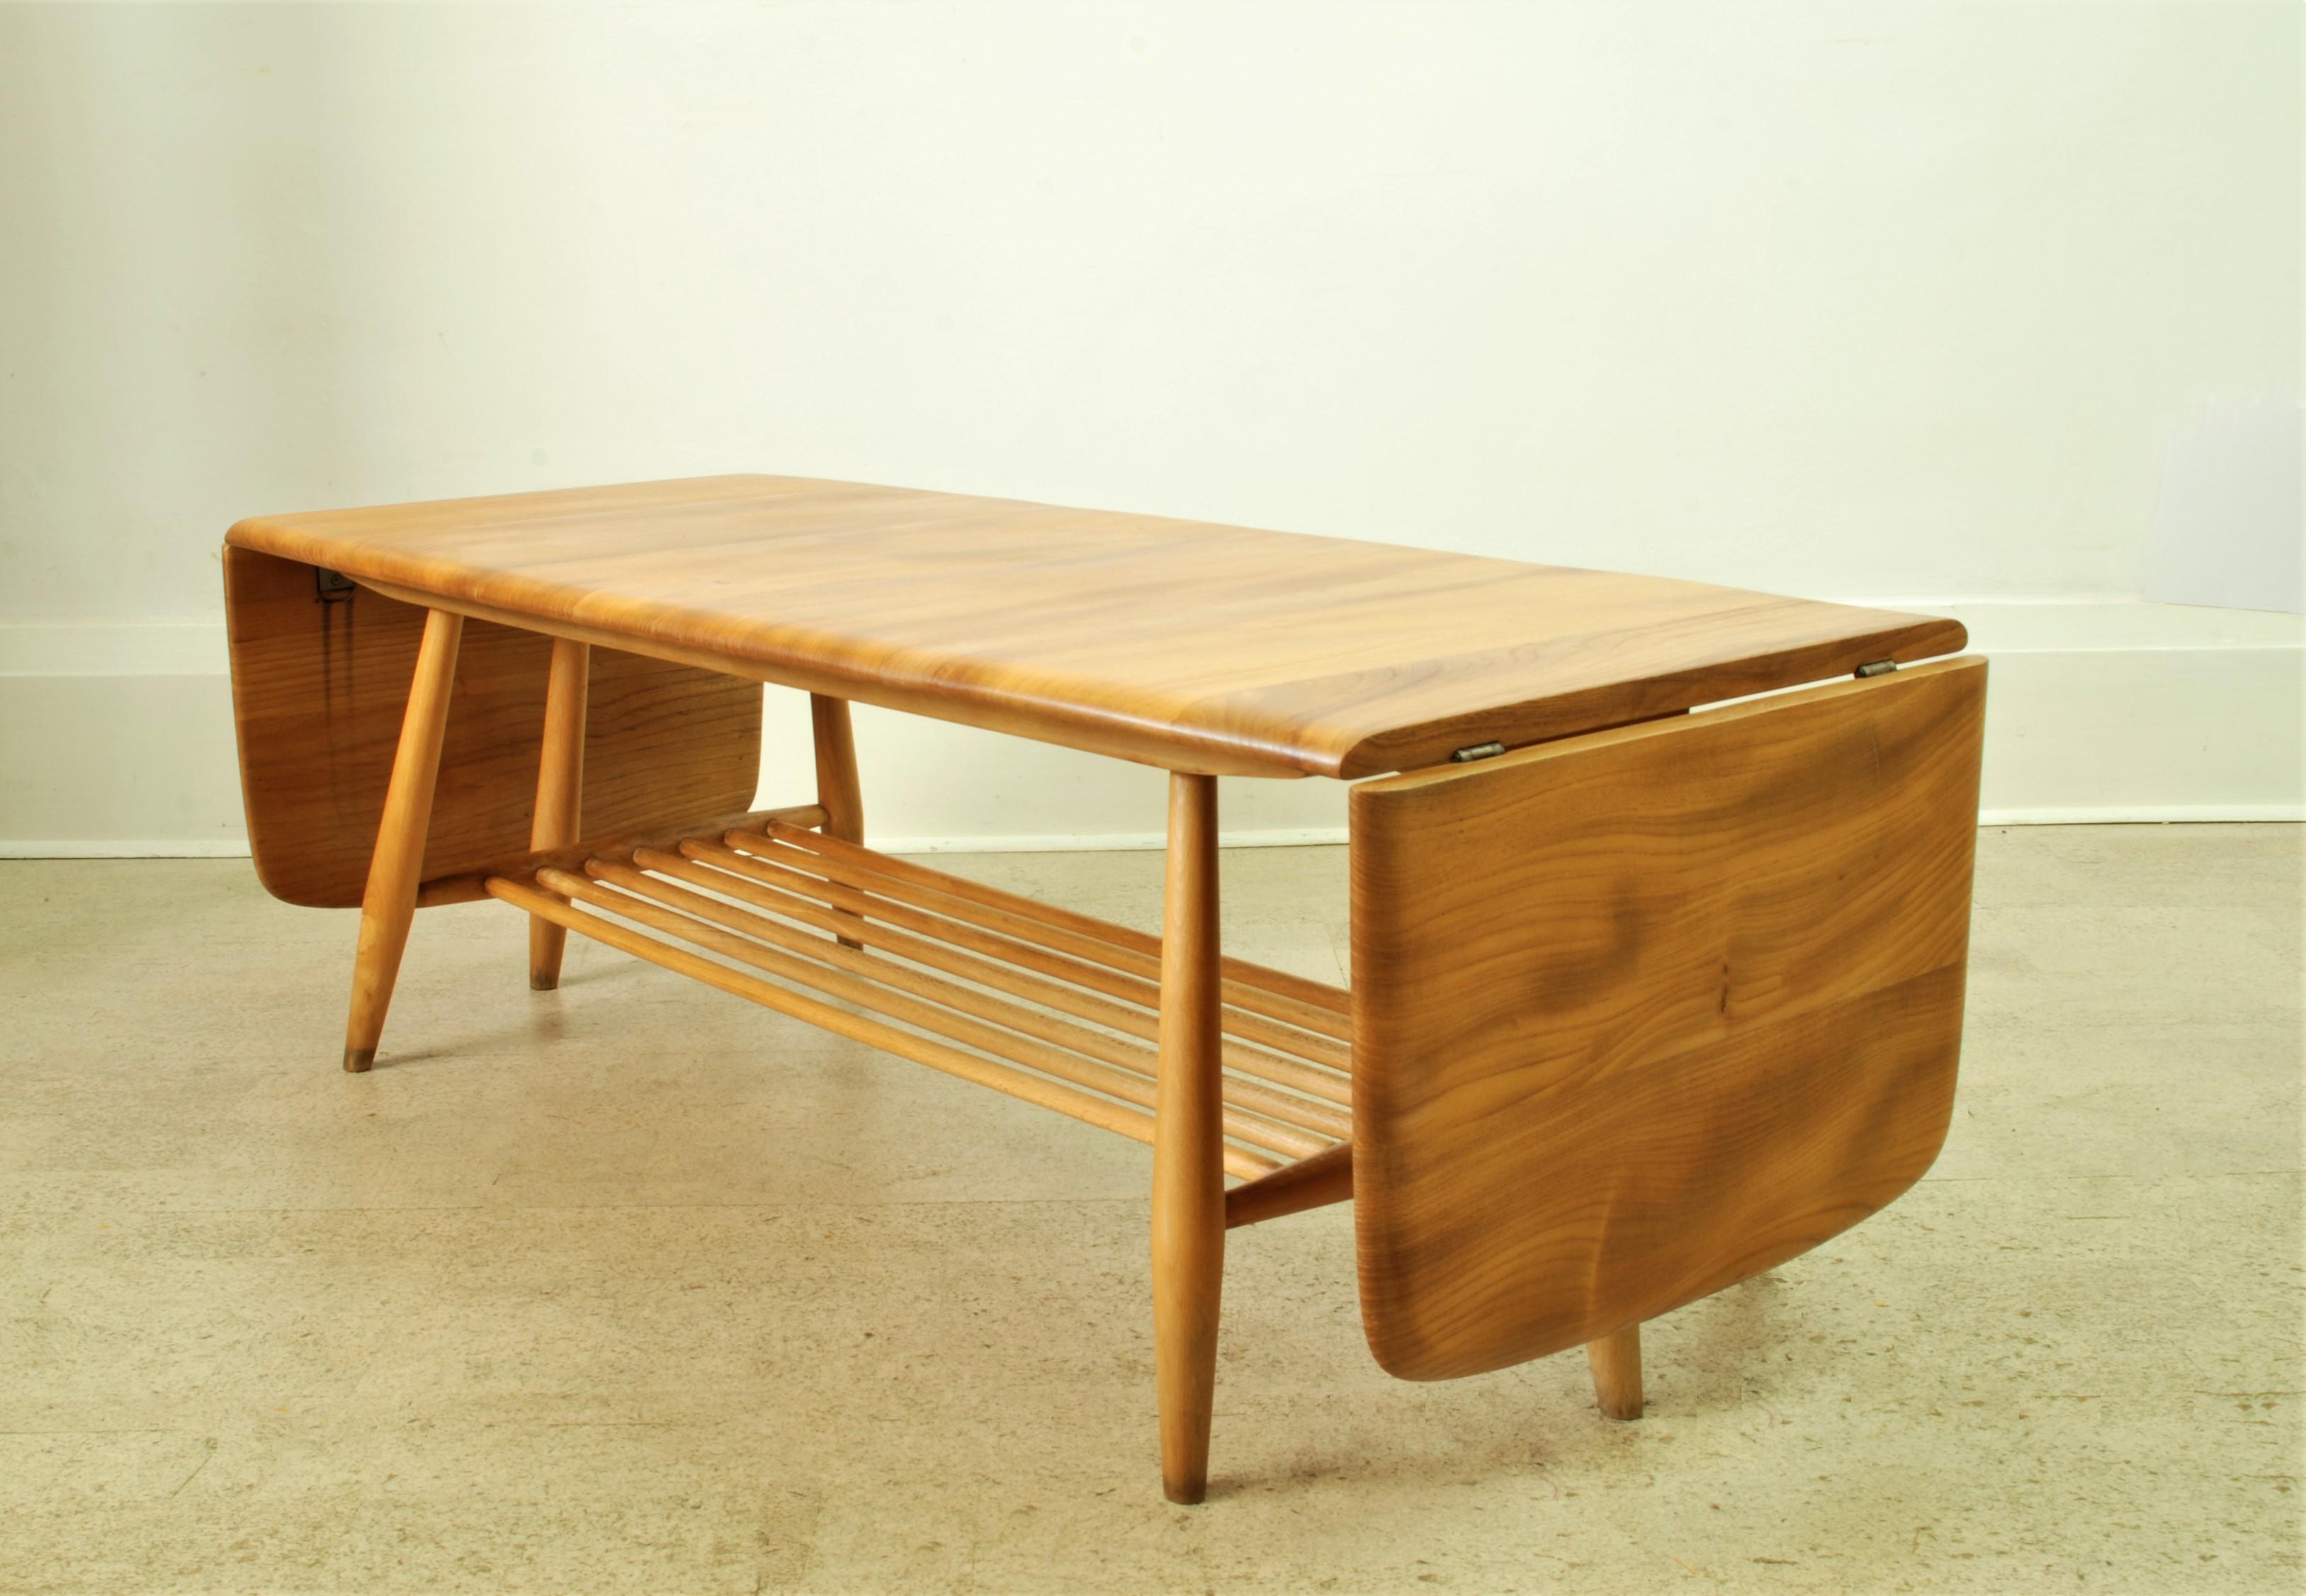 ERCOL COFFEE TABLE